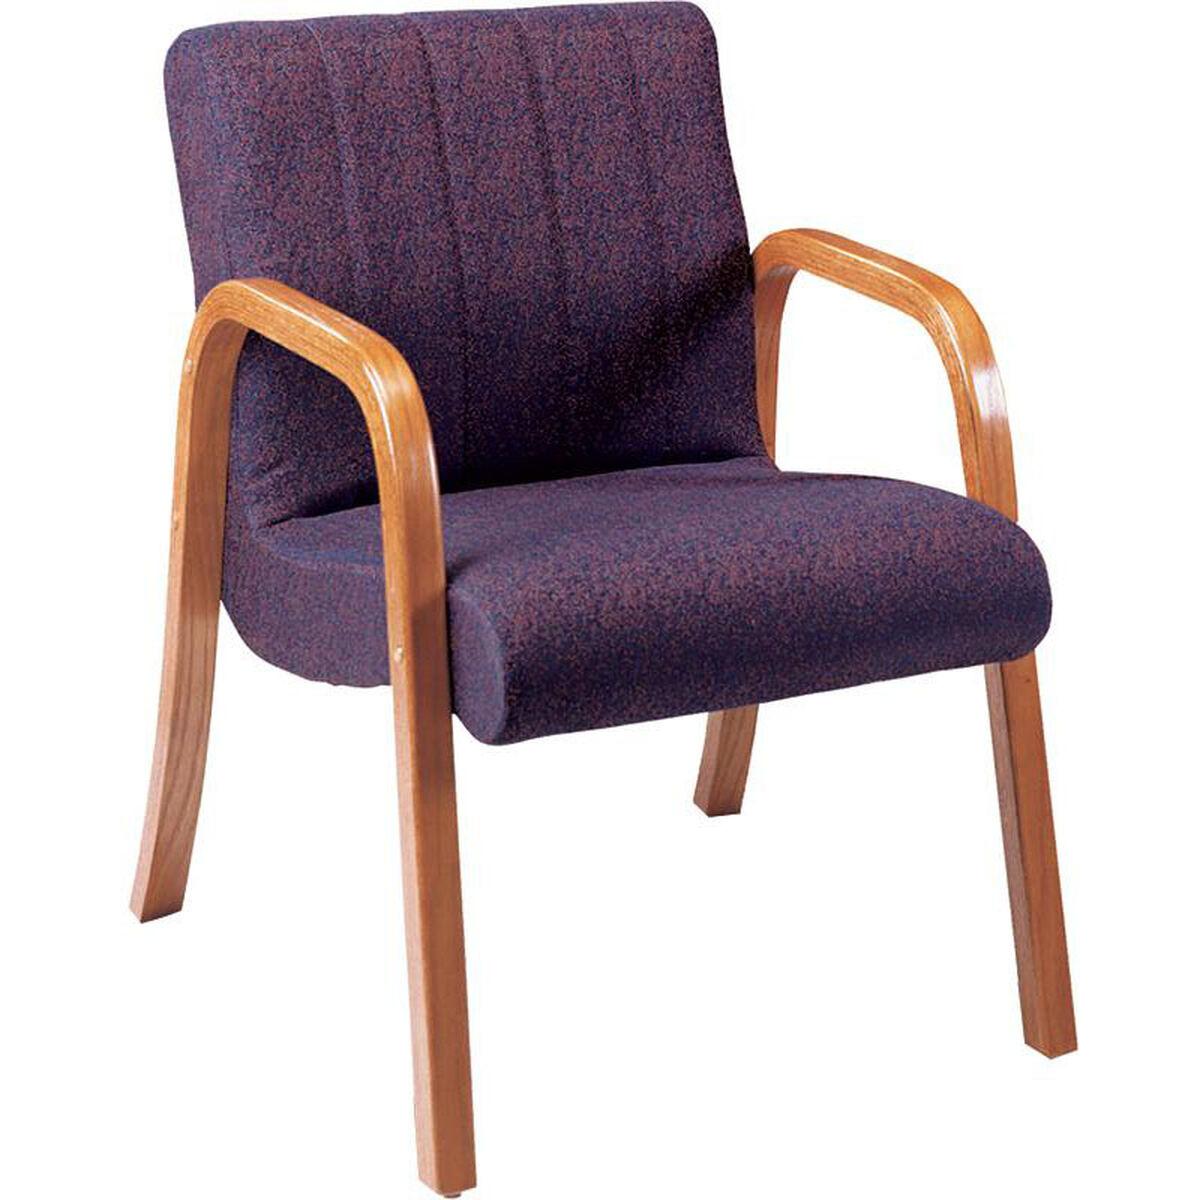 High Point Furniture Industries 1003 Hpf